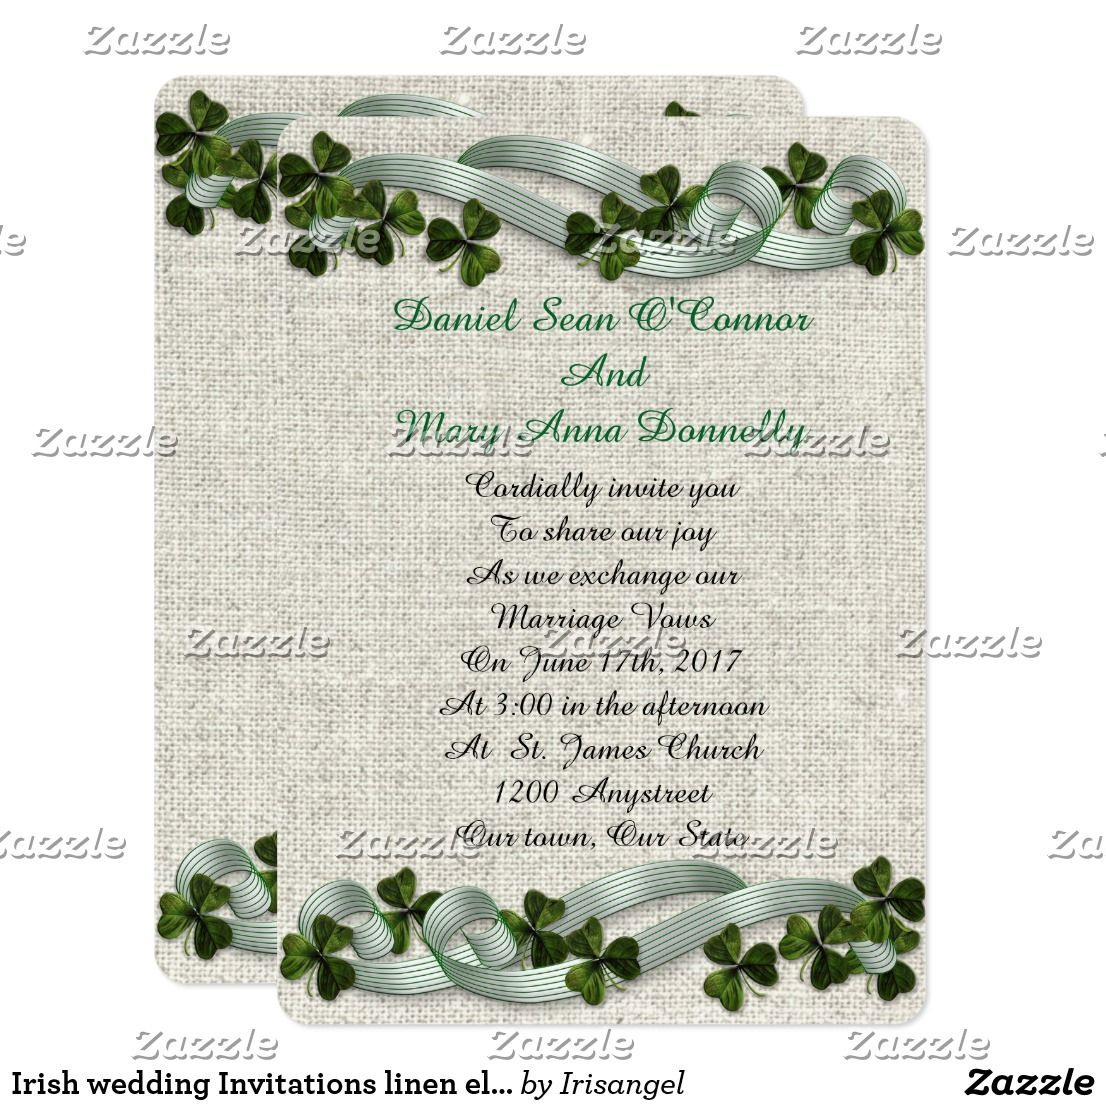 Unique Irish Themed Wedding Invitations Illustration - The Wedding ...